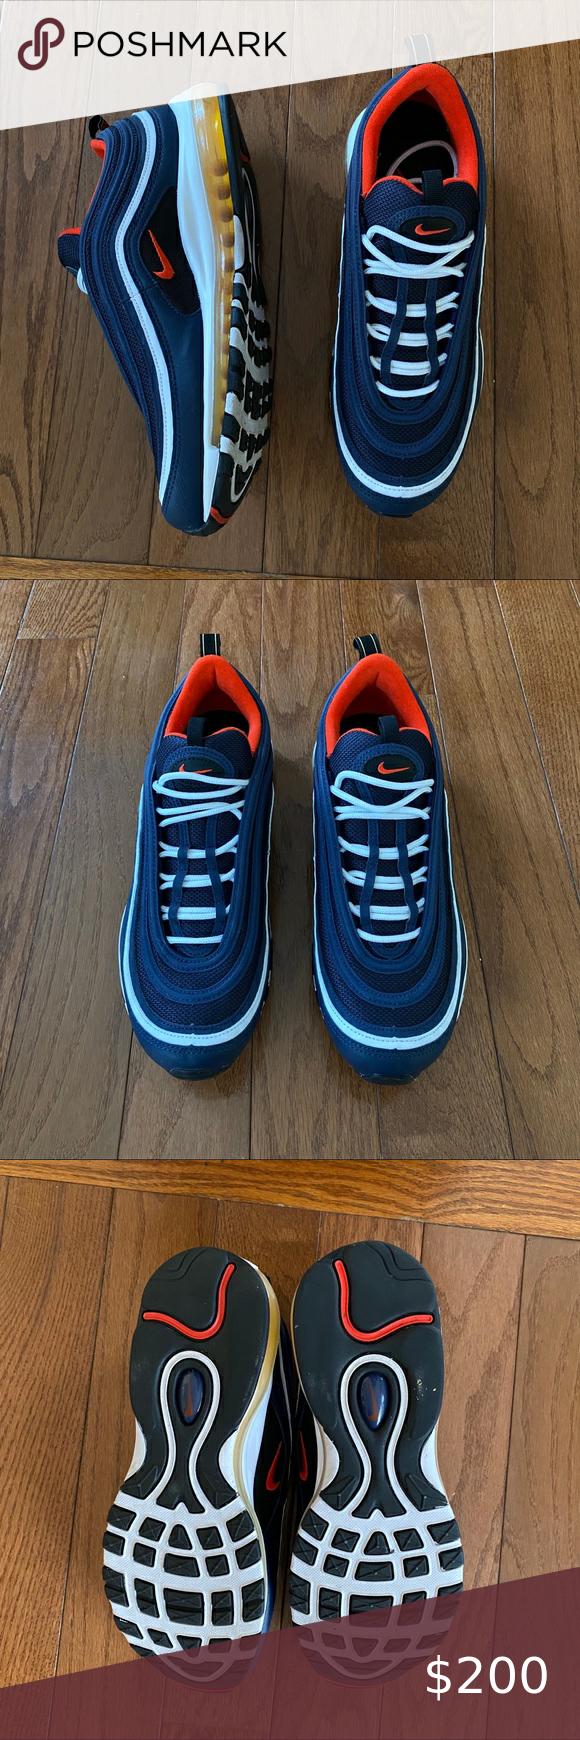 venda barato eua gama exclusiva 2018 sapatos upwwards nike